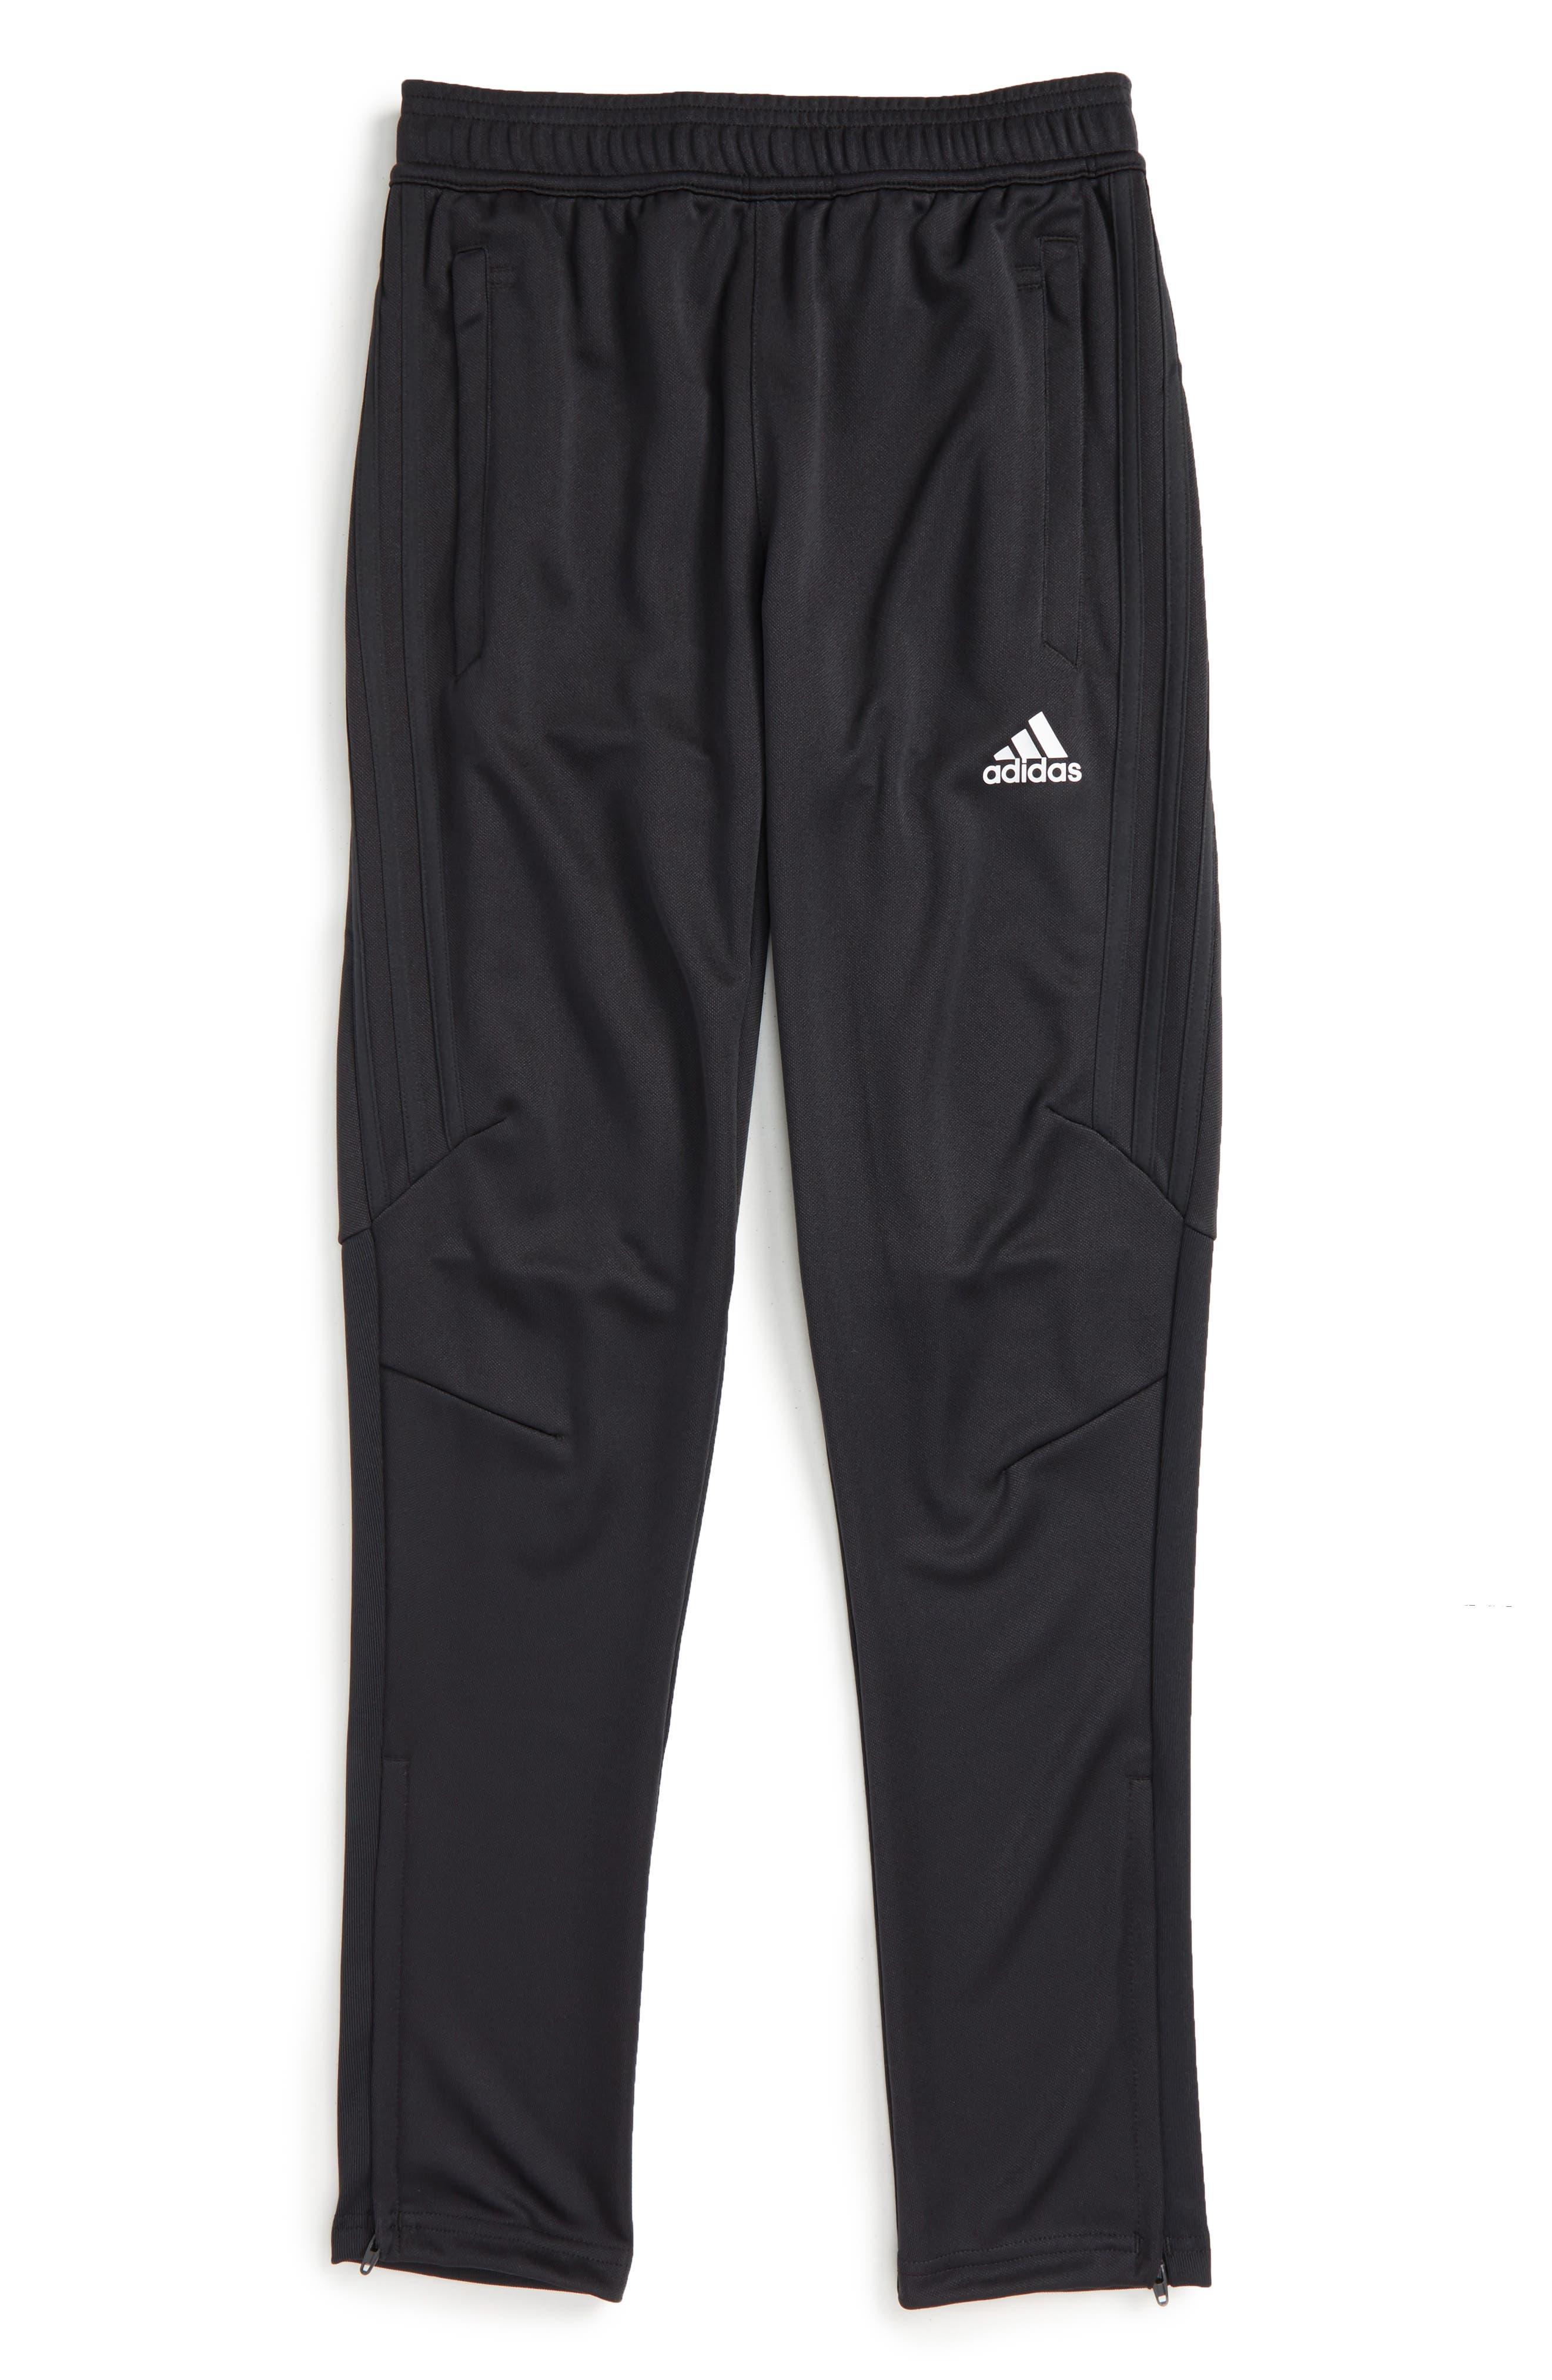 adidas Originals Tiro 17 Training Pants (Little Boys & Big Boys)